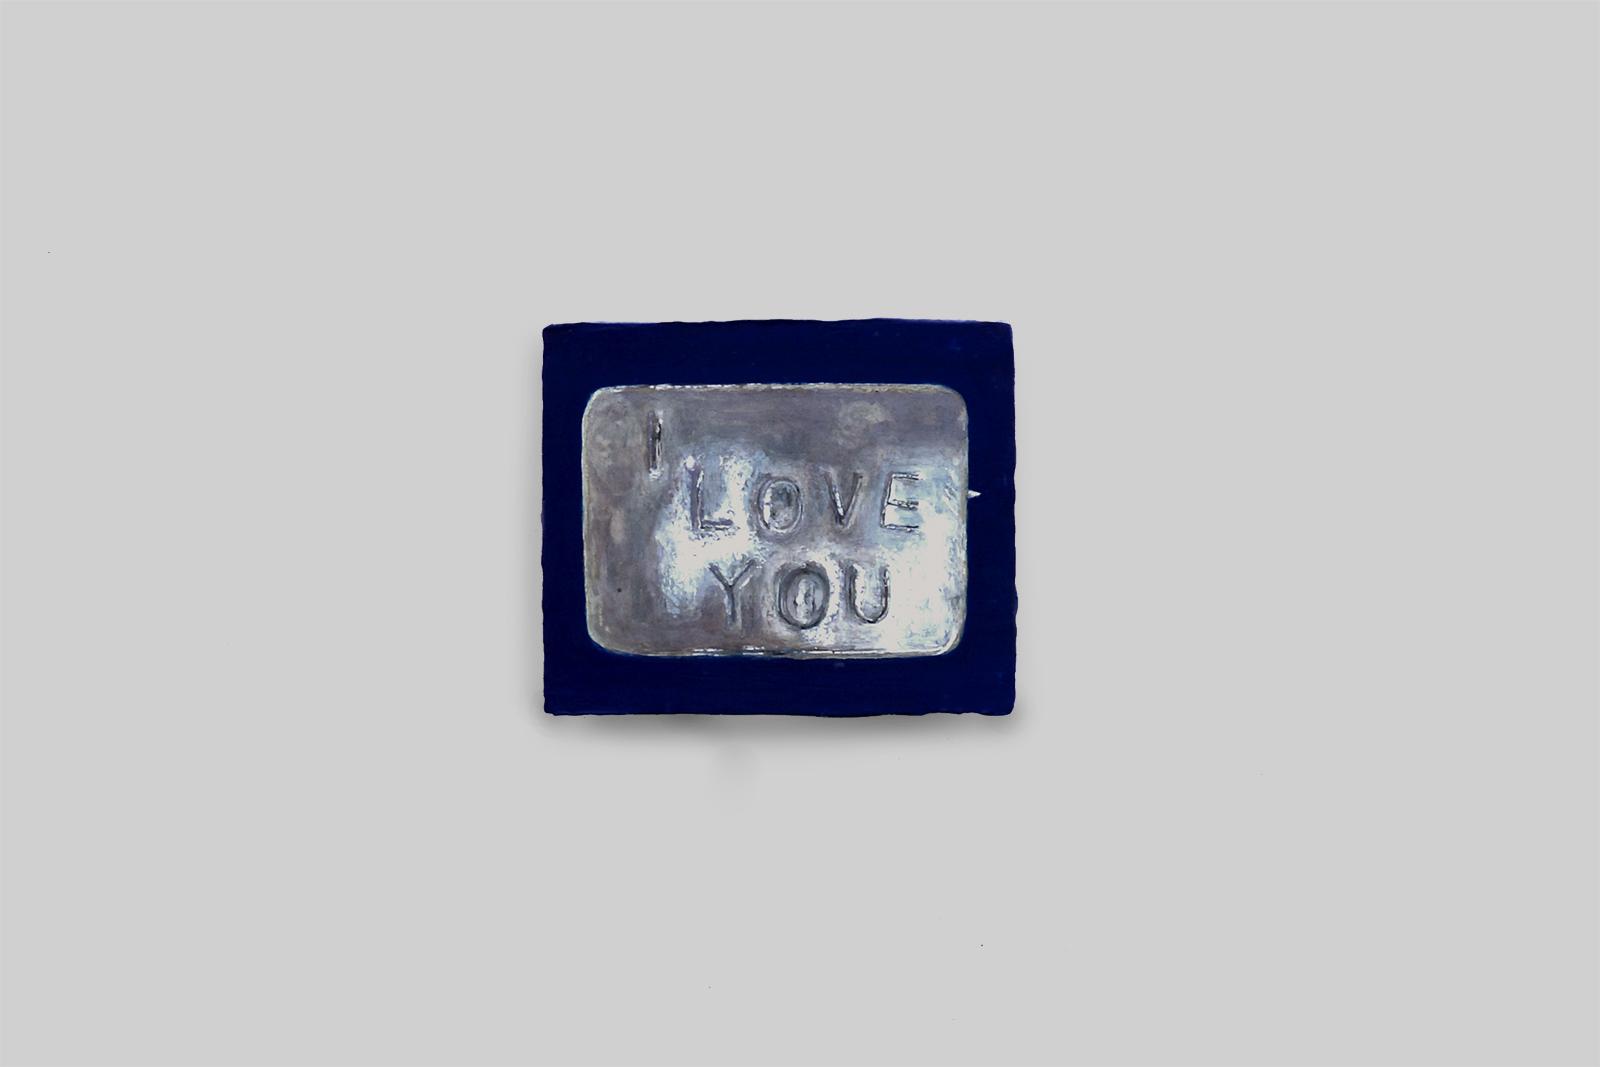 'I love you', 2013, tempera/paneel, 10 x 12 cm